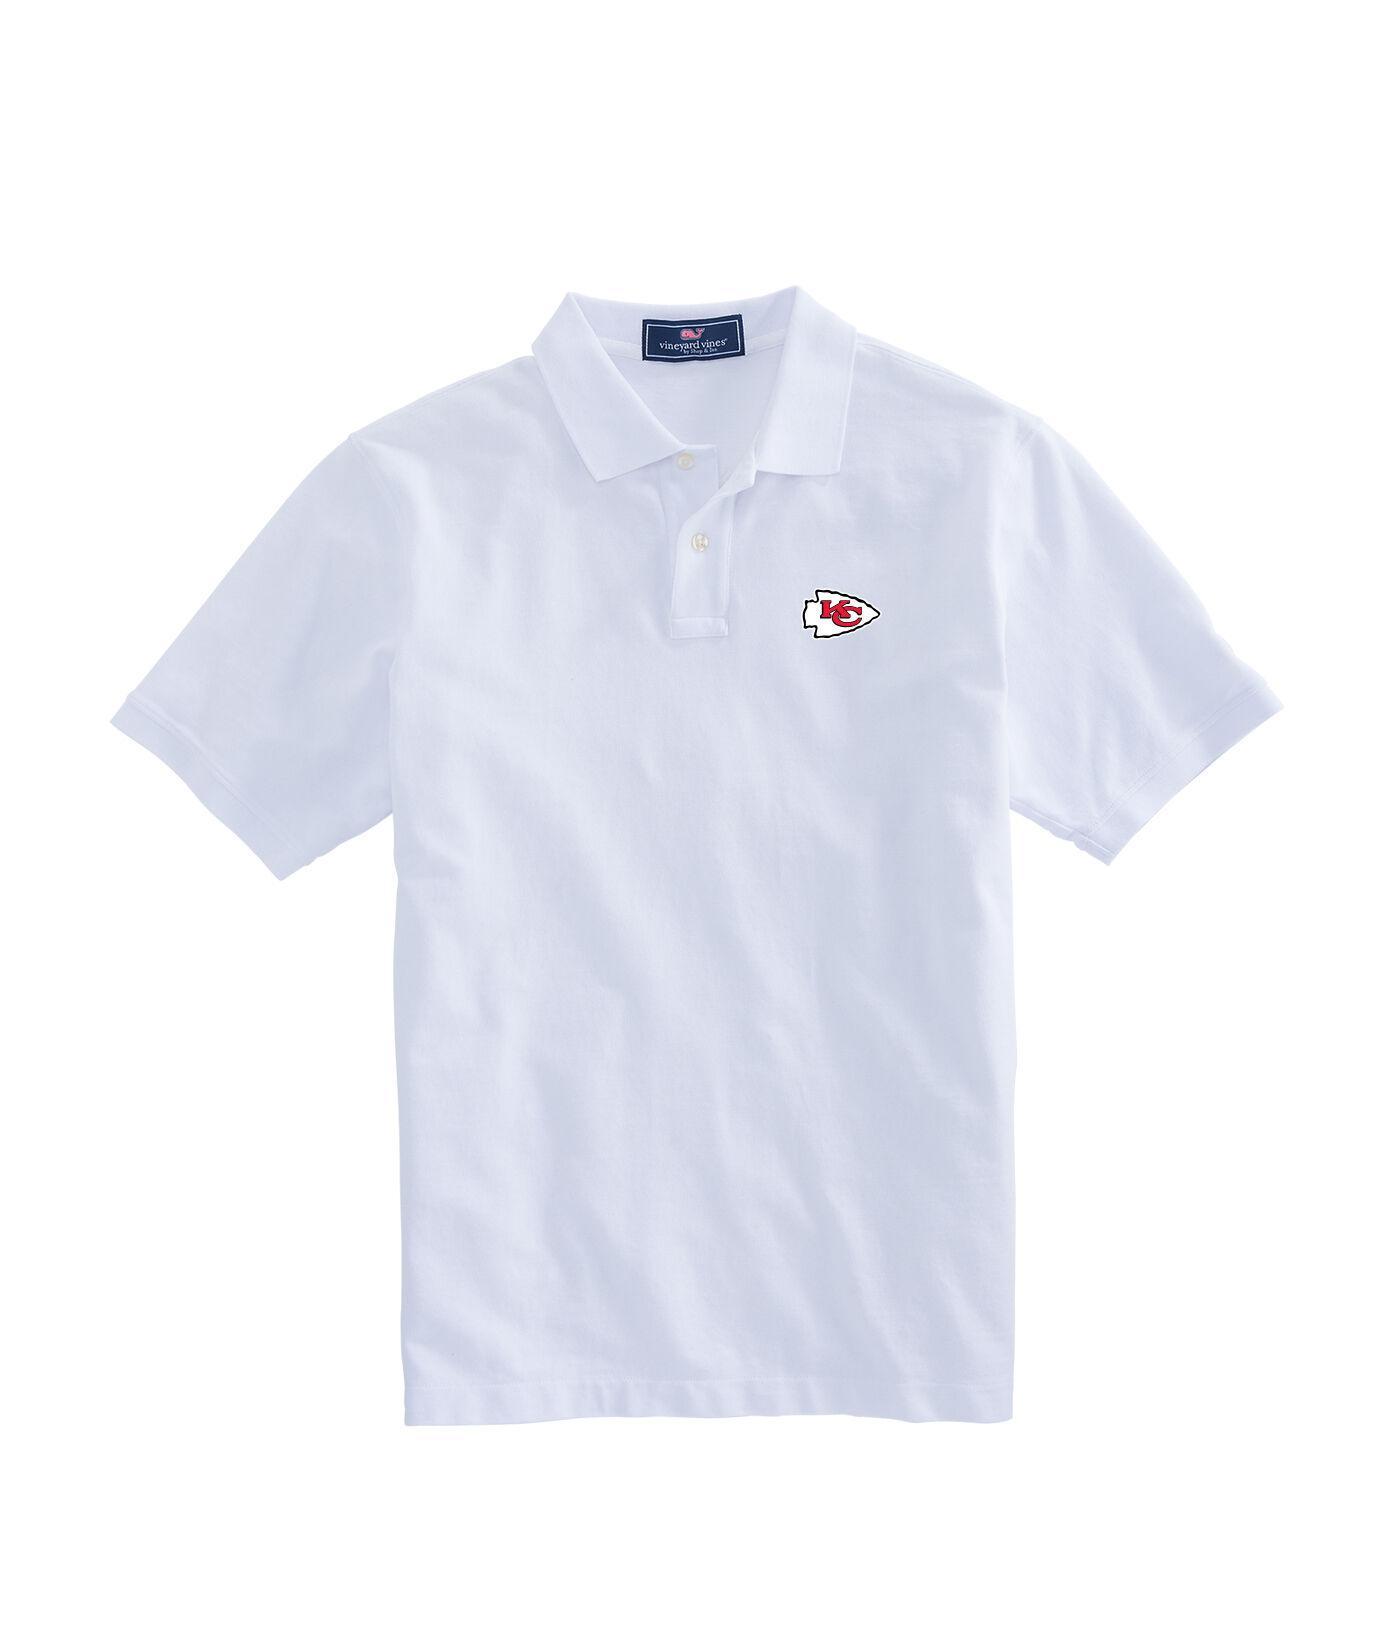 the best attitude 3f7b1 ccfbd Women's White Kansas City Chiefs - Nfl Stretch Polo Shirt